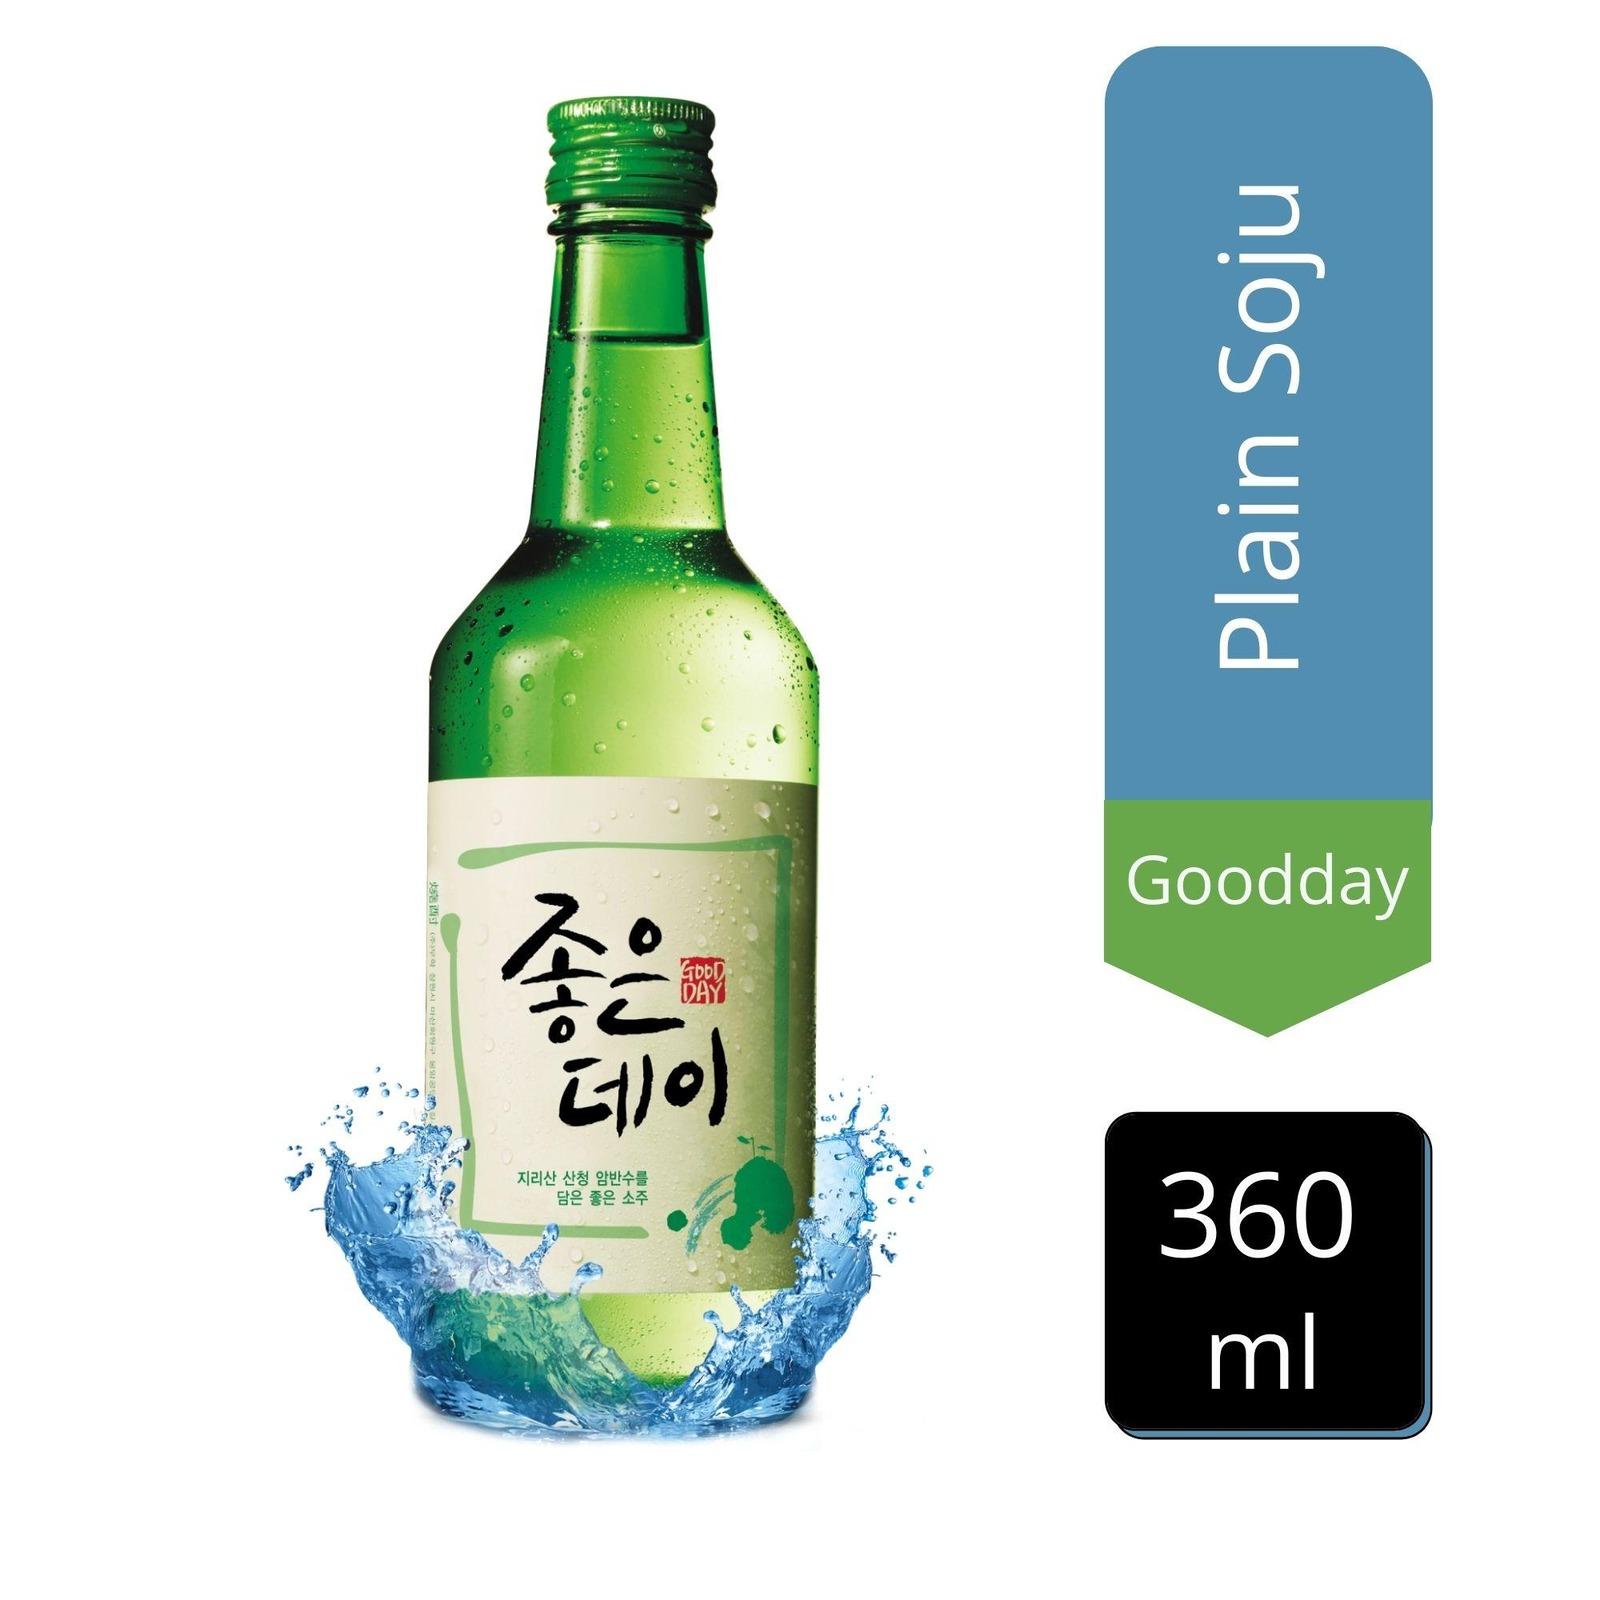 Goodday Plain Soju